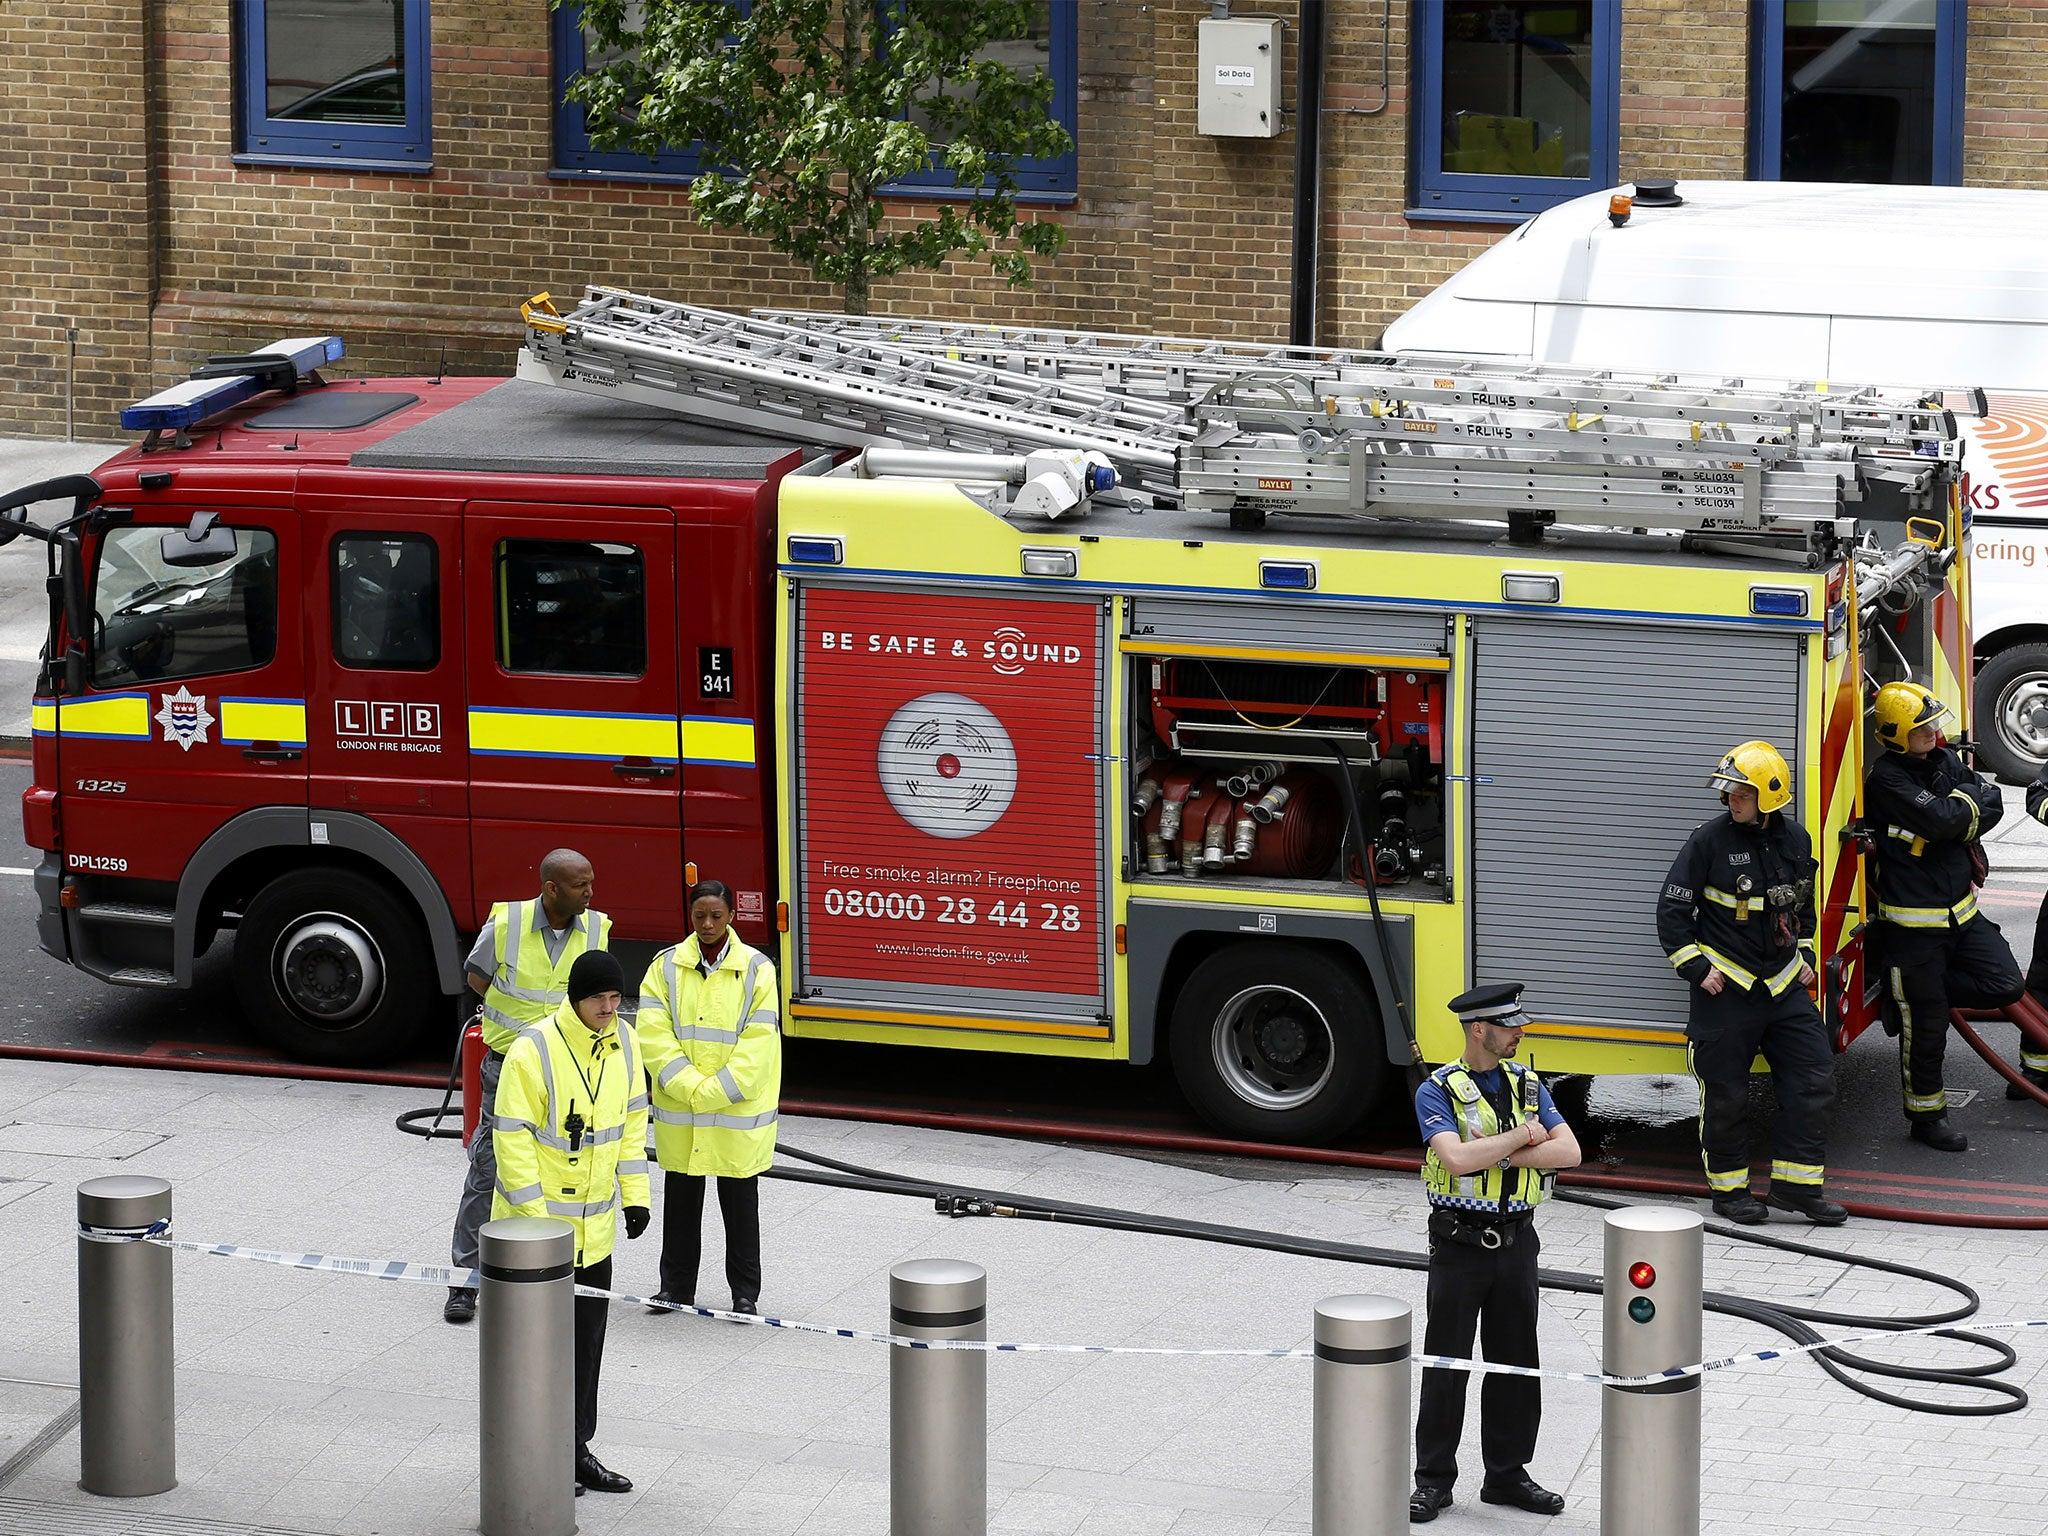 Nearly 100 people flee tower block fire in East London